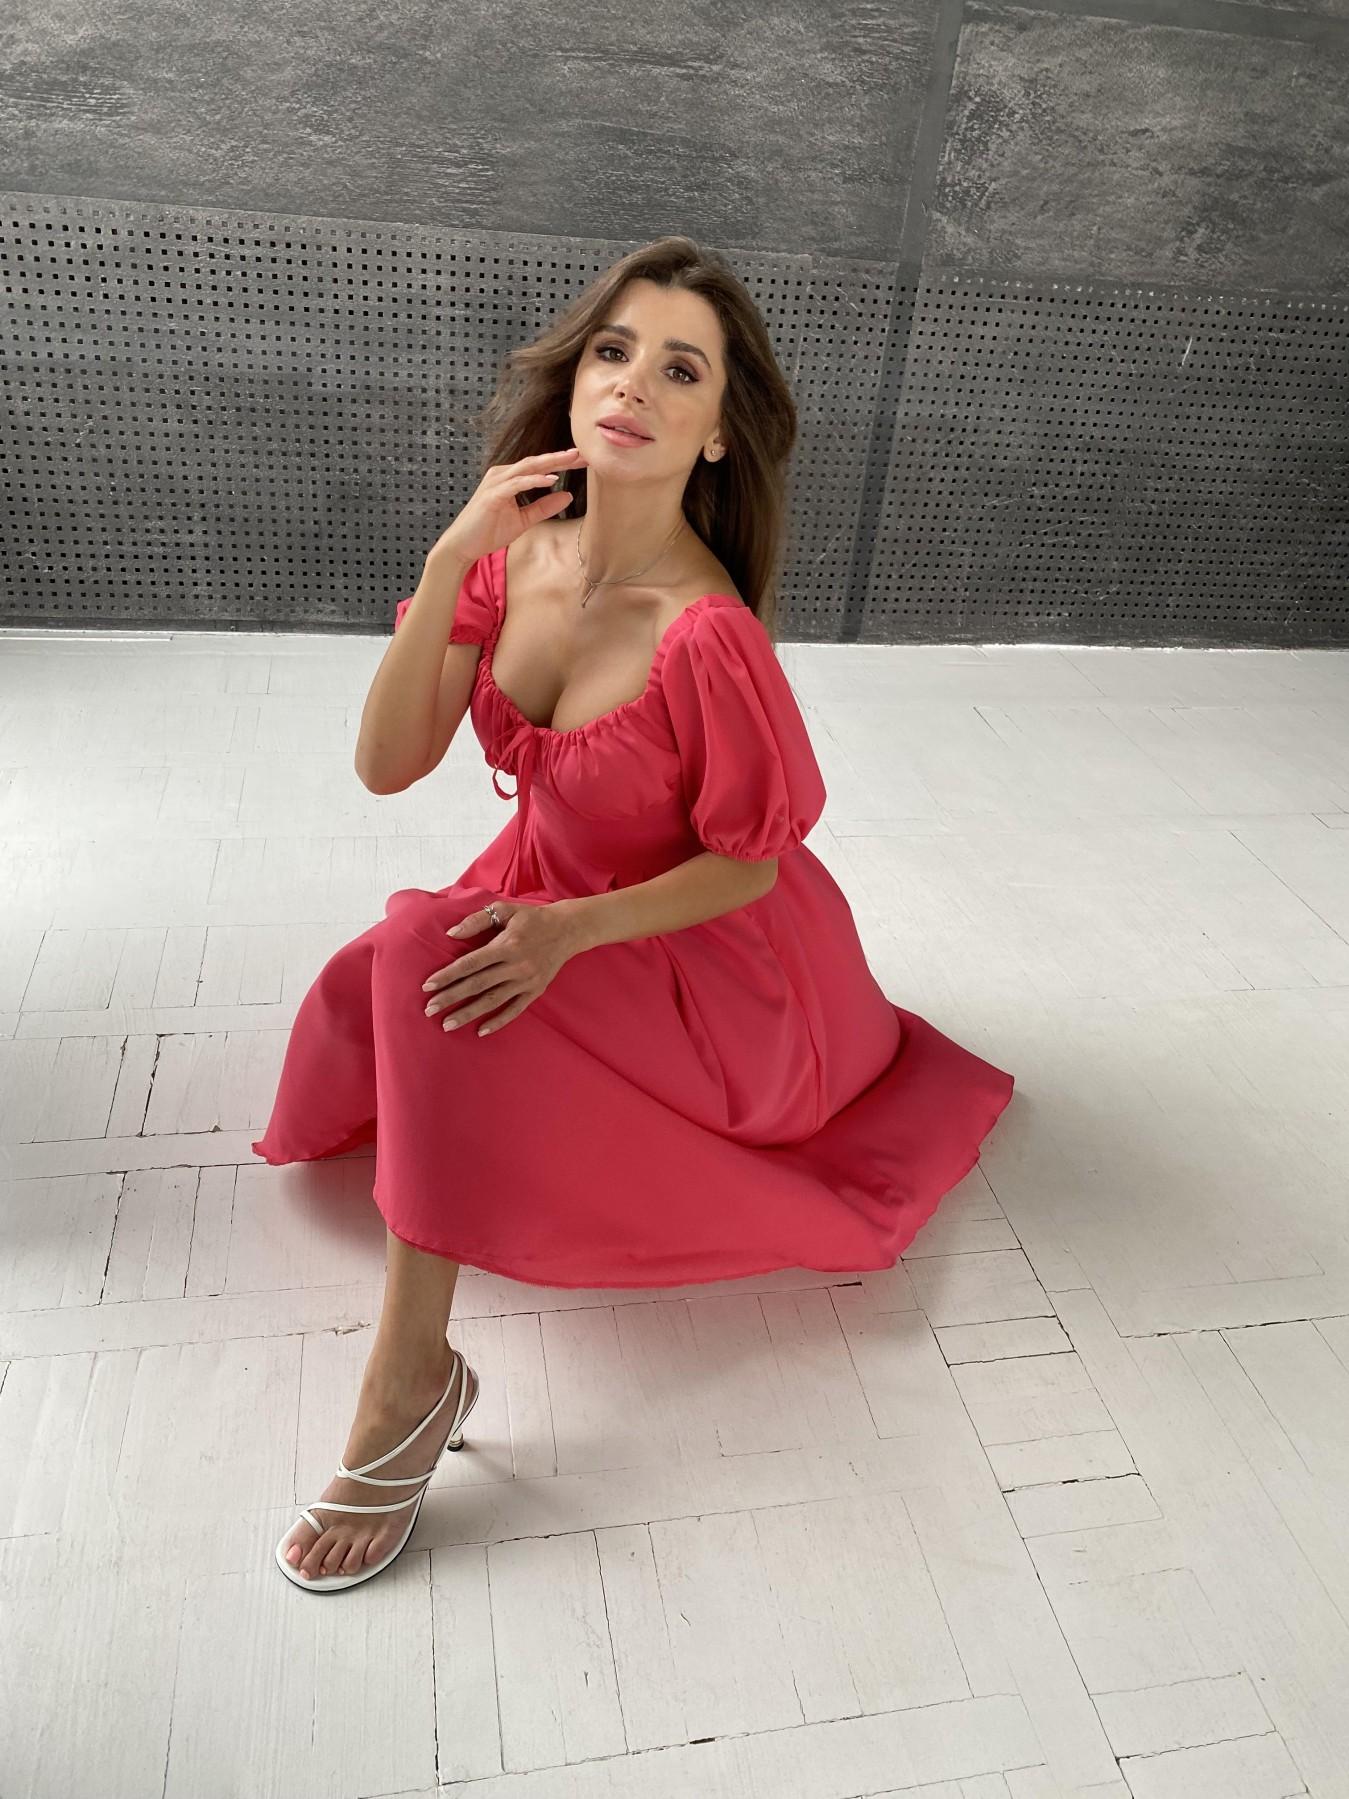 Кисес Миди платье из шифона креп 11443 АРТ. 48314 Цвет: Коралл - фото 2, интернет магазин tm-modus.ru